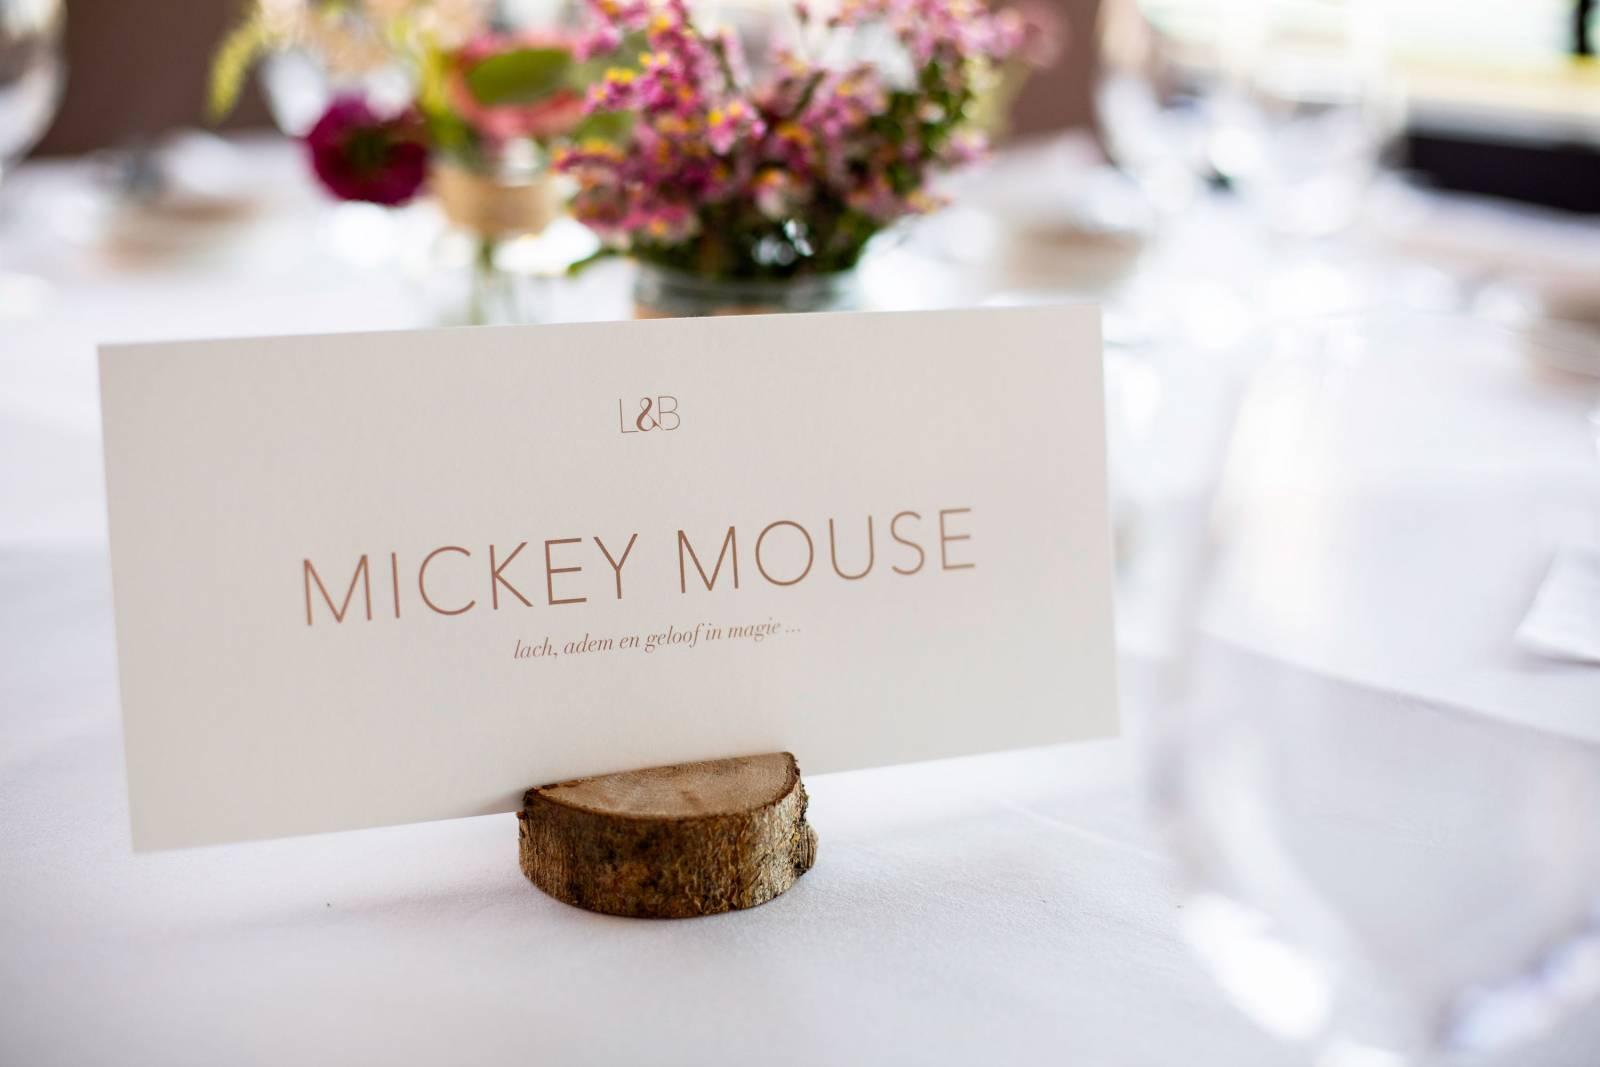 Scarabar - Trouwuitnodiging - Huwelijksuitnodiging - Drukwerk - Huwelijk - Trouw - Bruiloft - House of Weddings - 14